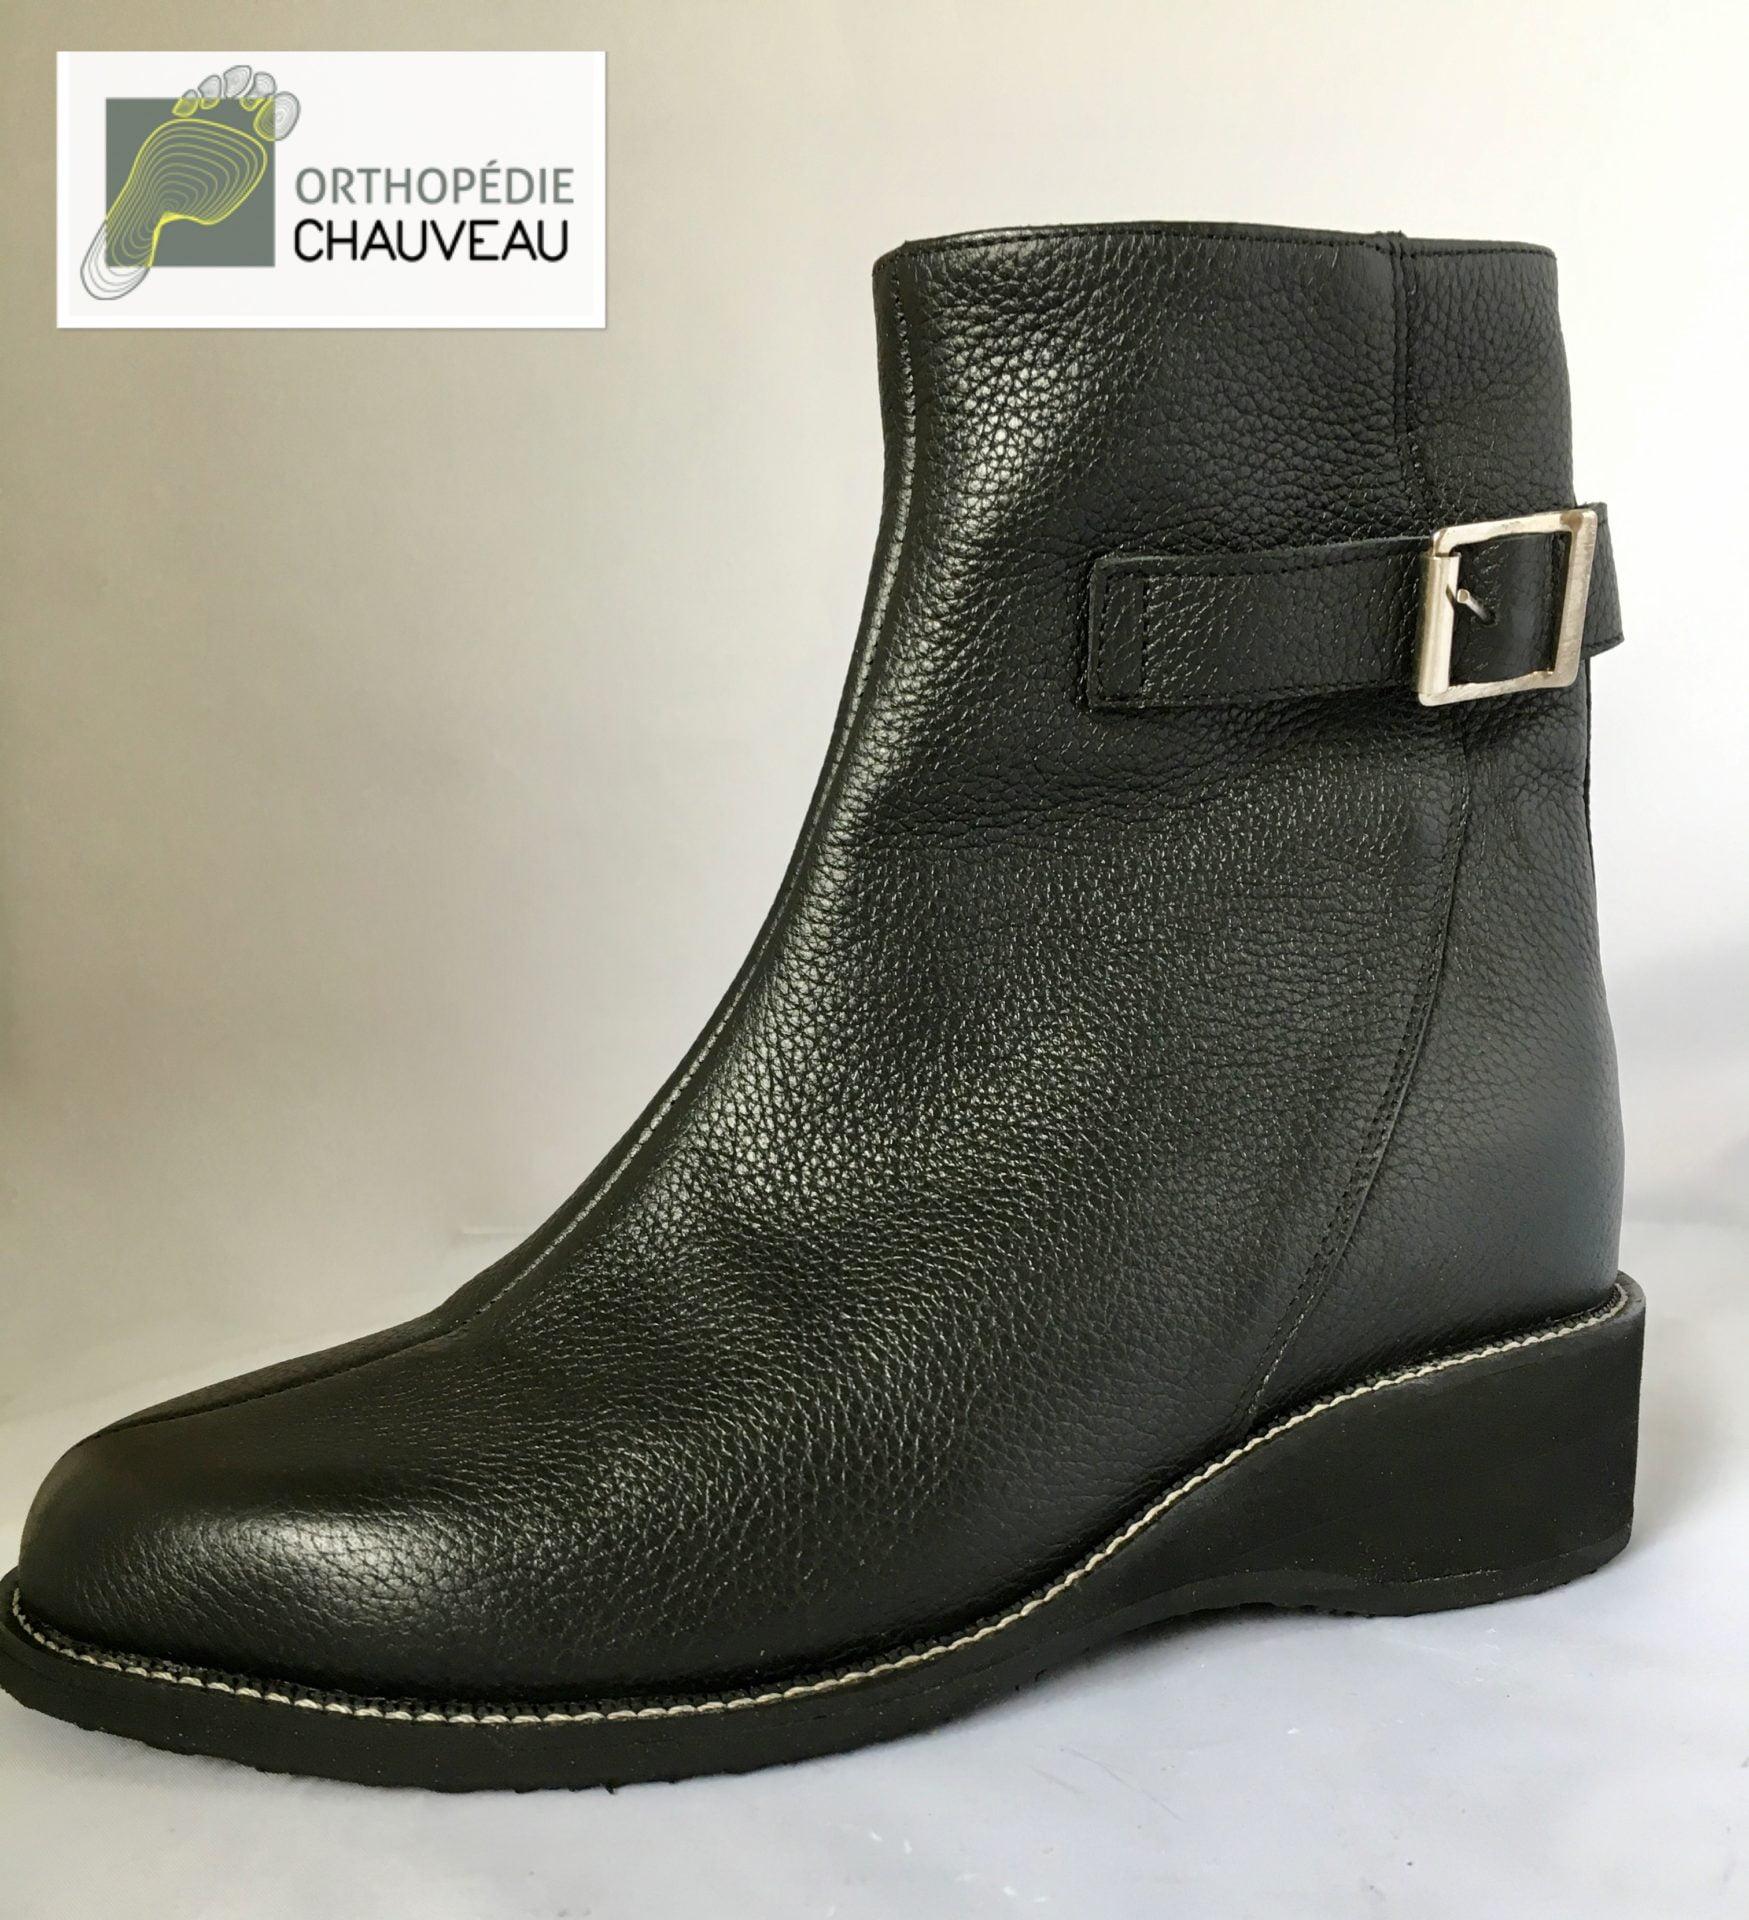 chaussures orthopediques Rennes st malo bottines noir